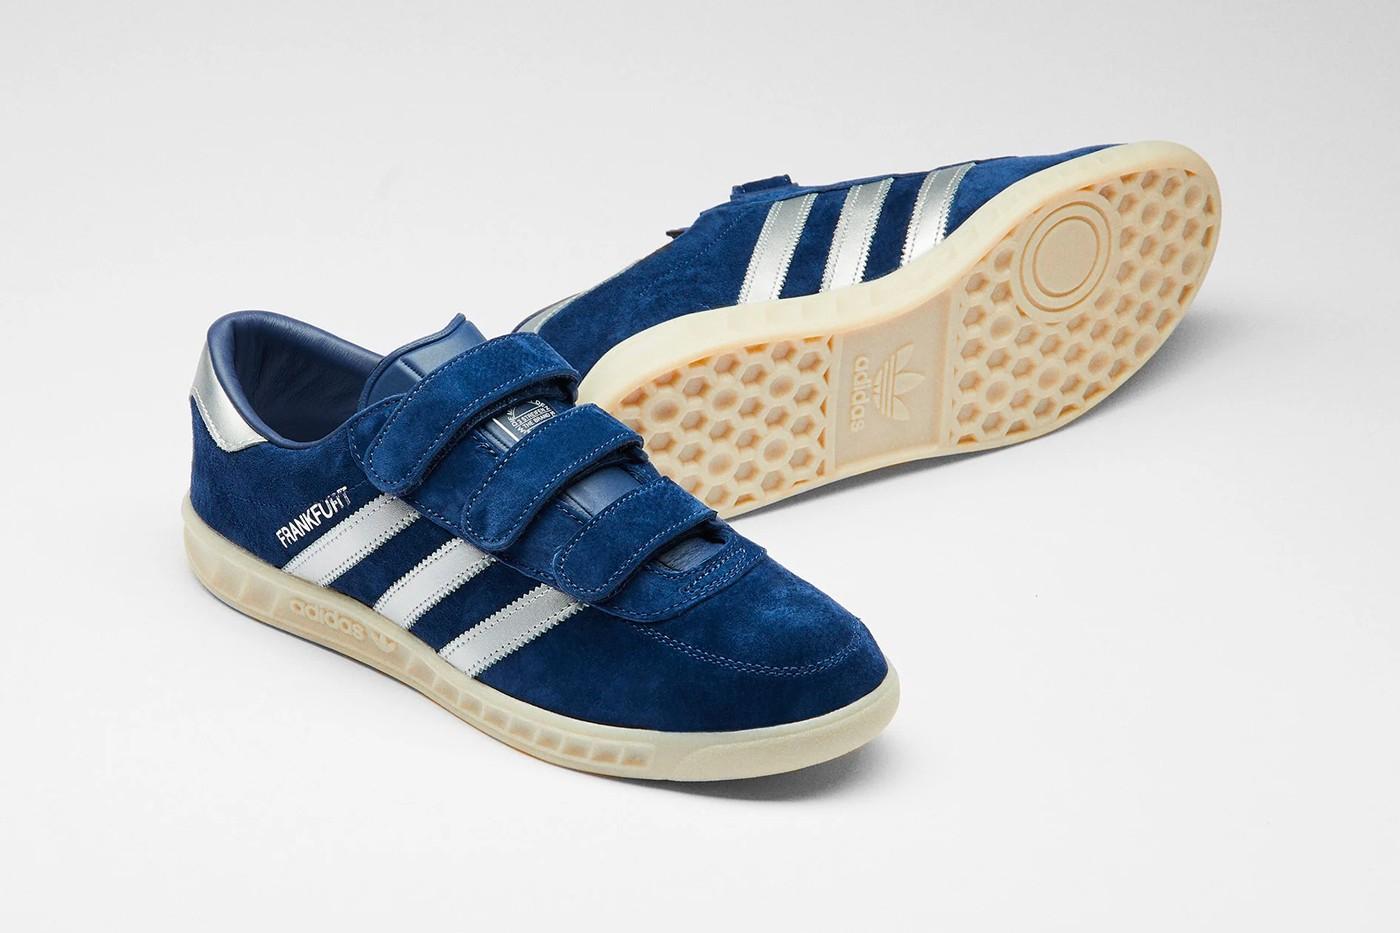 adidas sneakers frankfurt